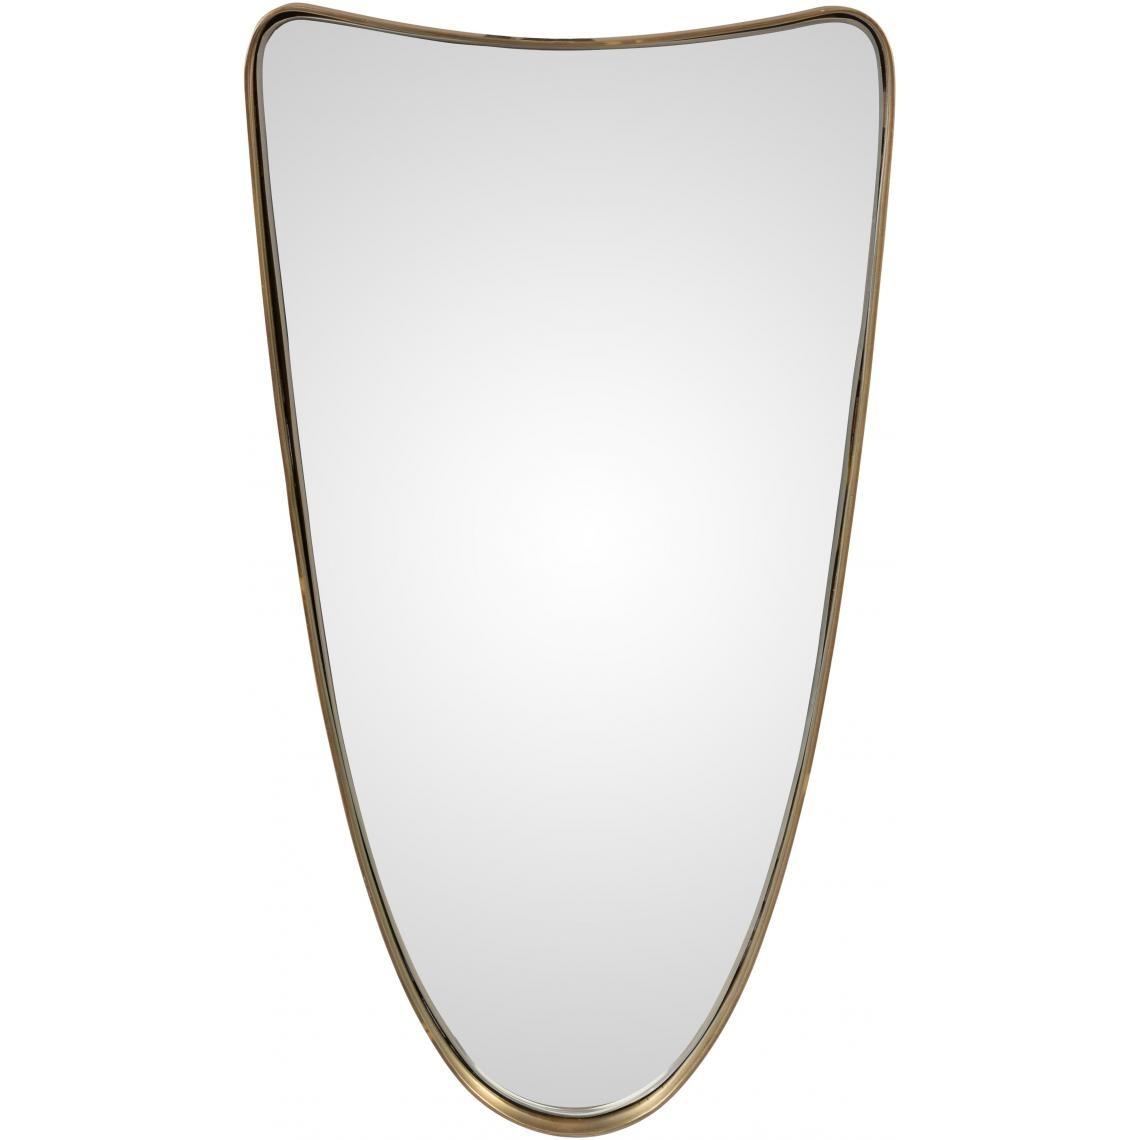 miroir design avec cadre en fer dore pamo